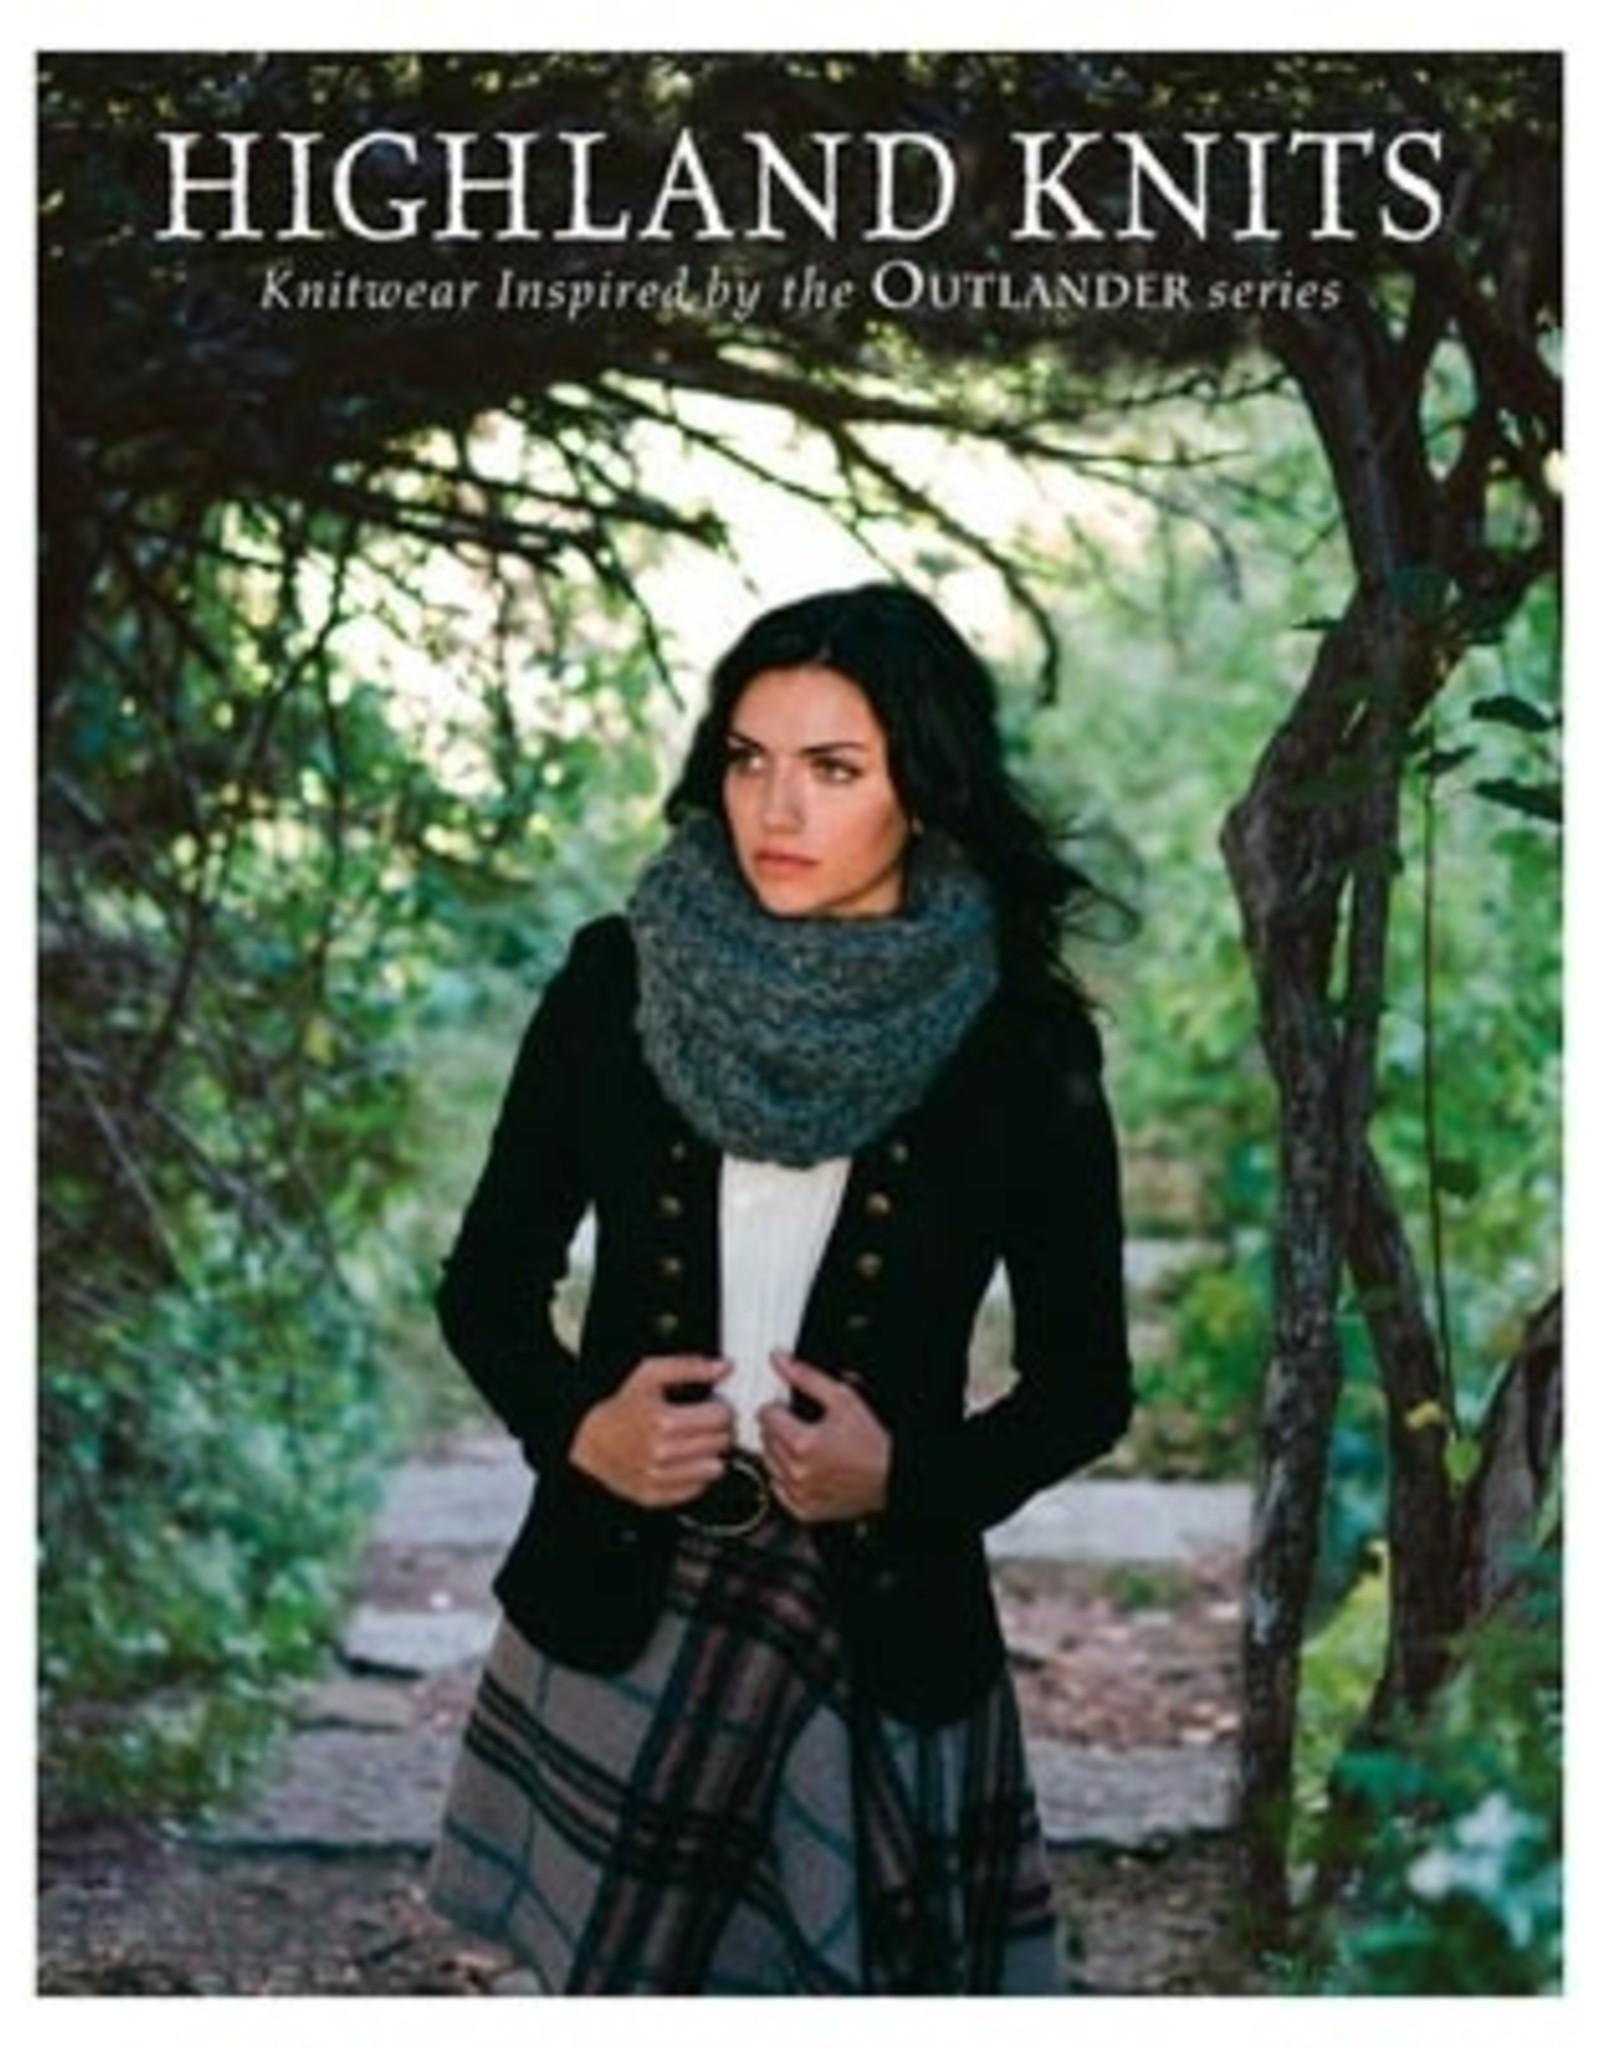 Estelle Highland Knits